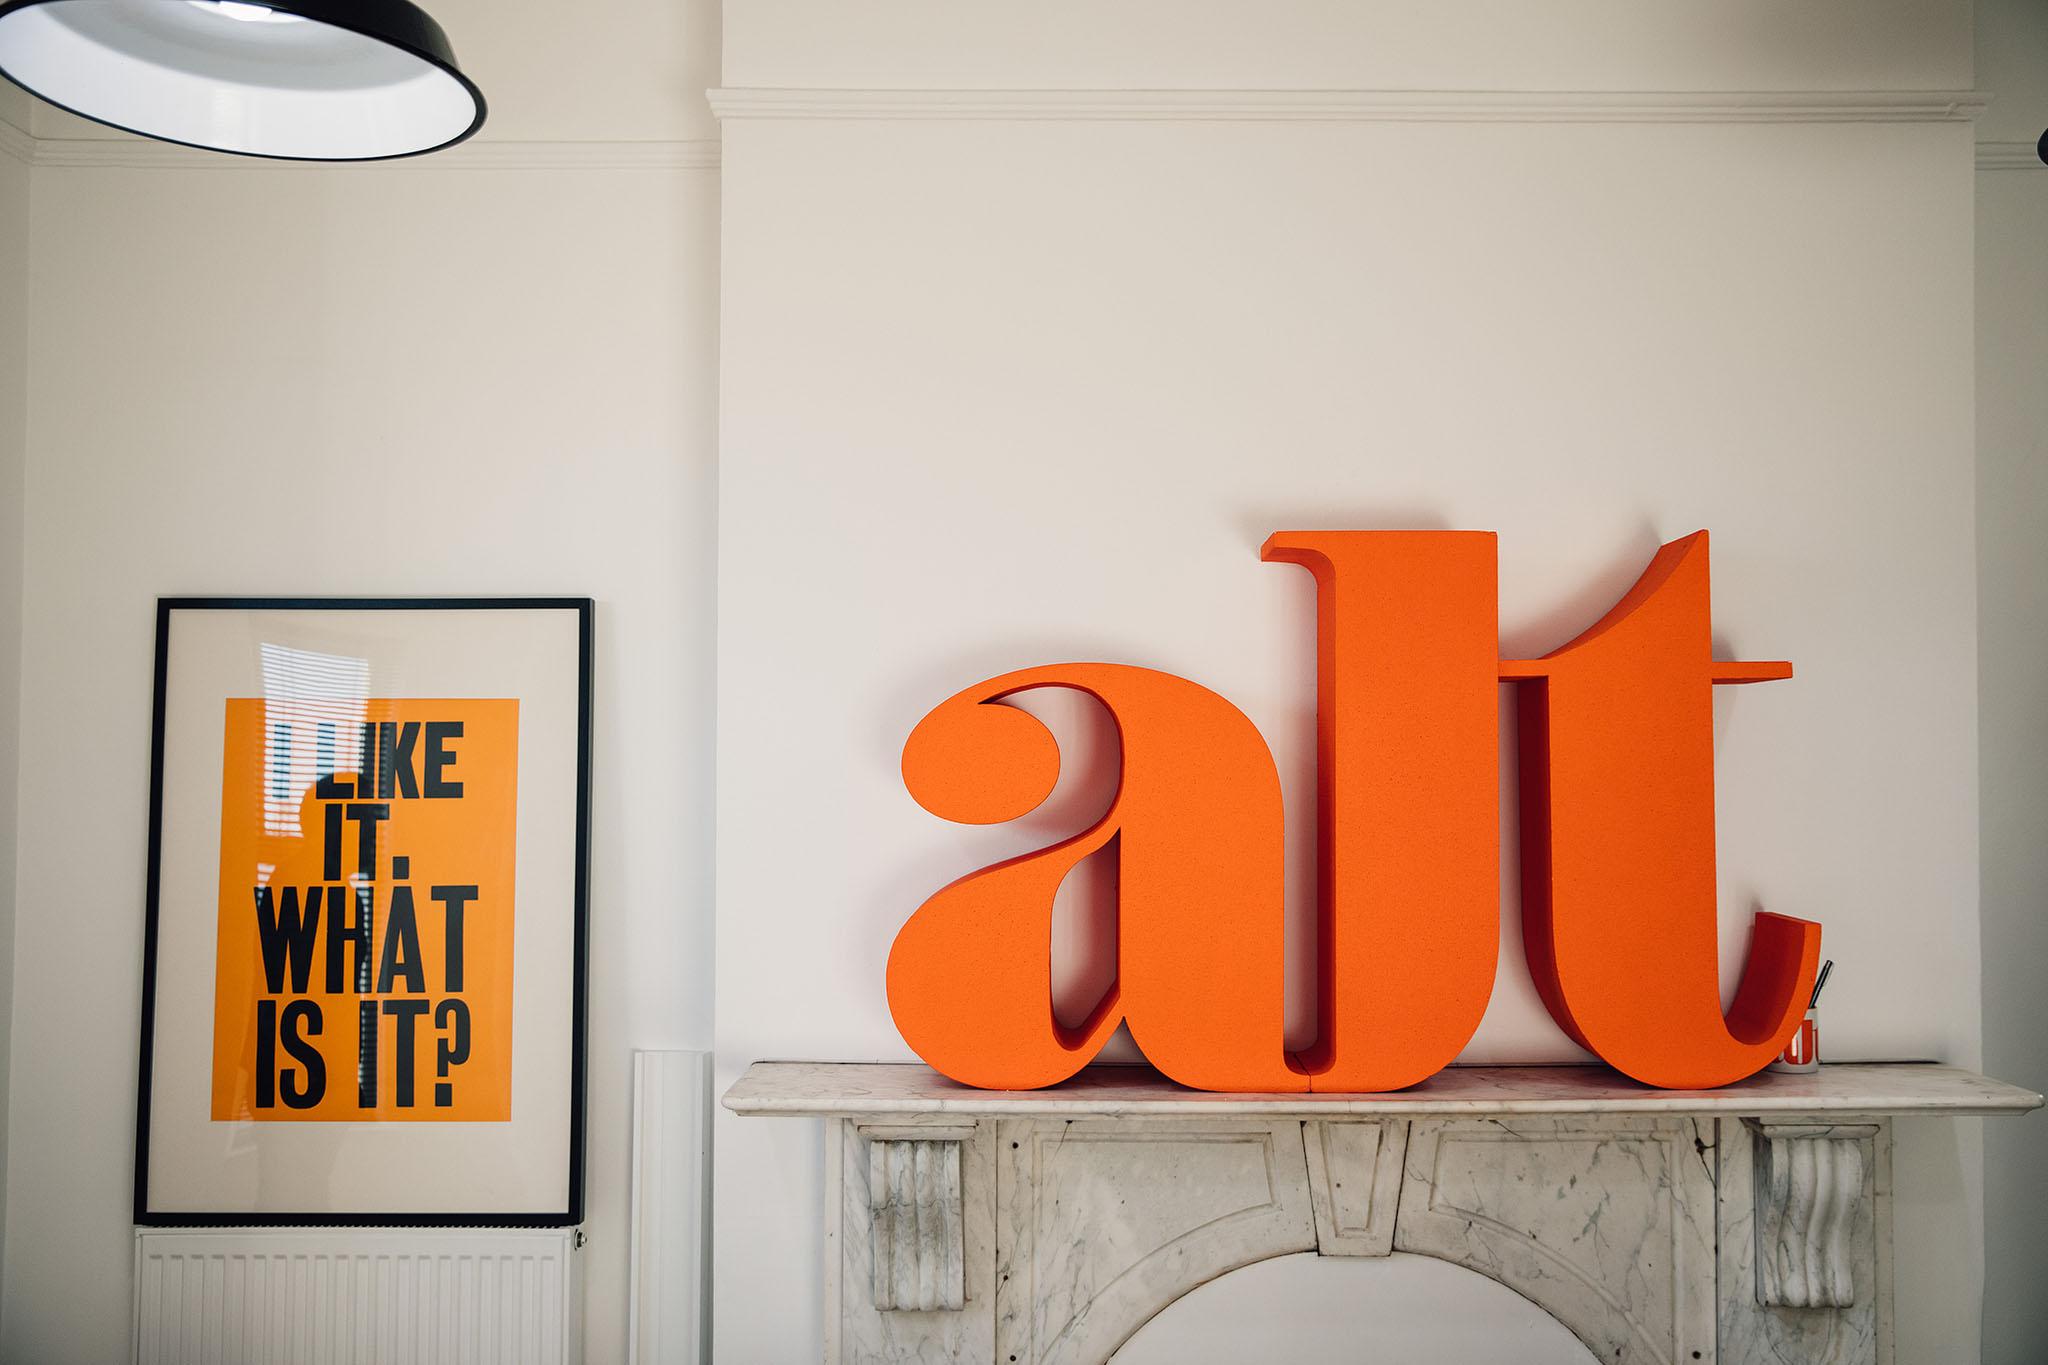 (c) Alt-design.net